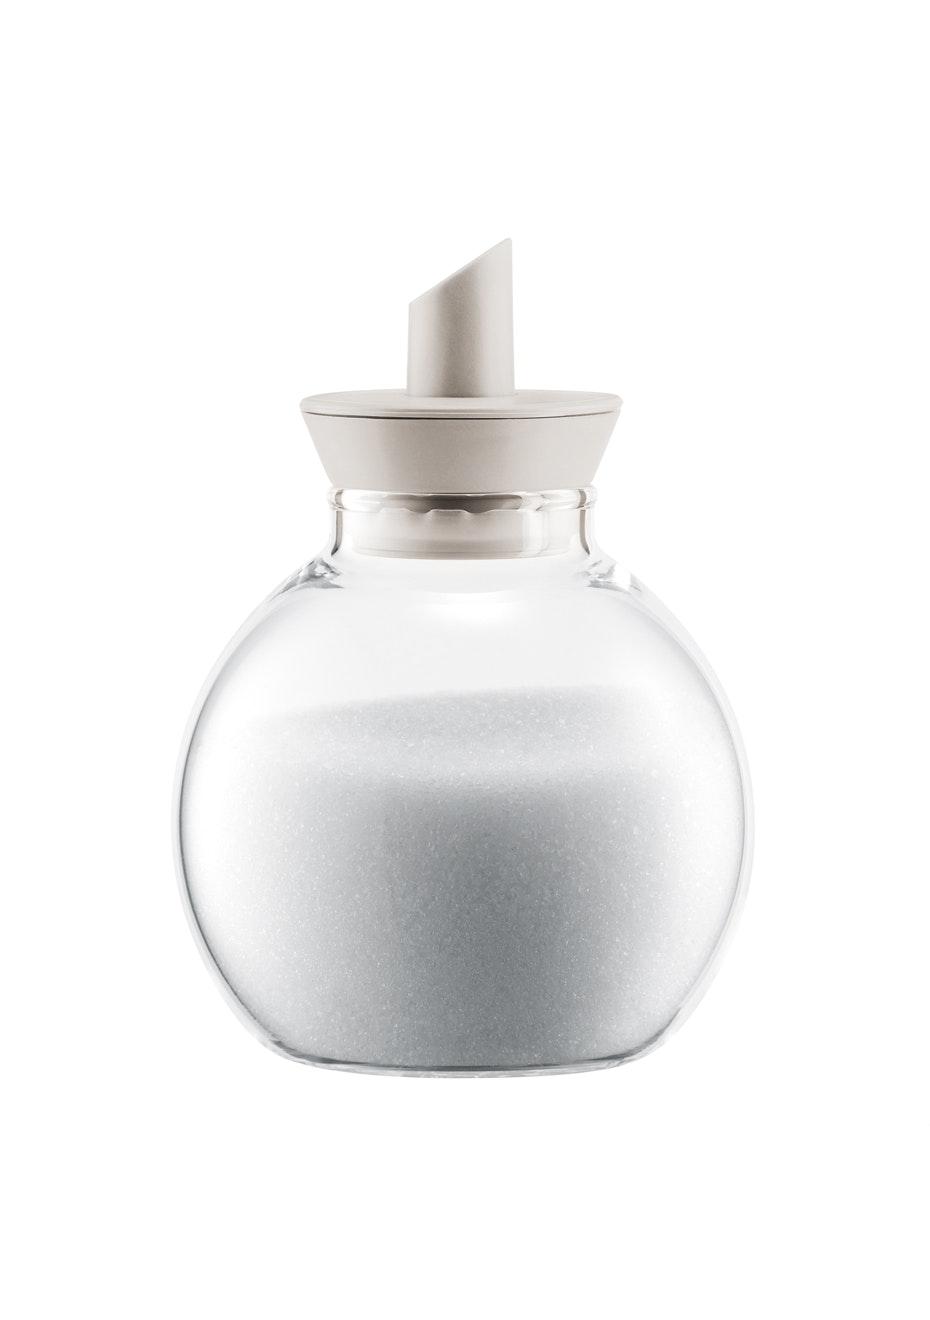 Bodum - Sugar Dispenser - Off White